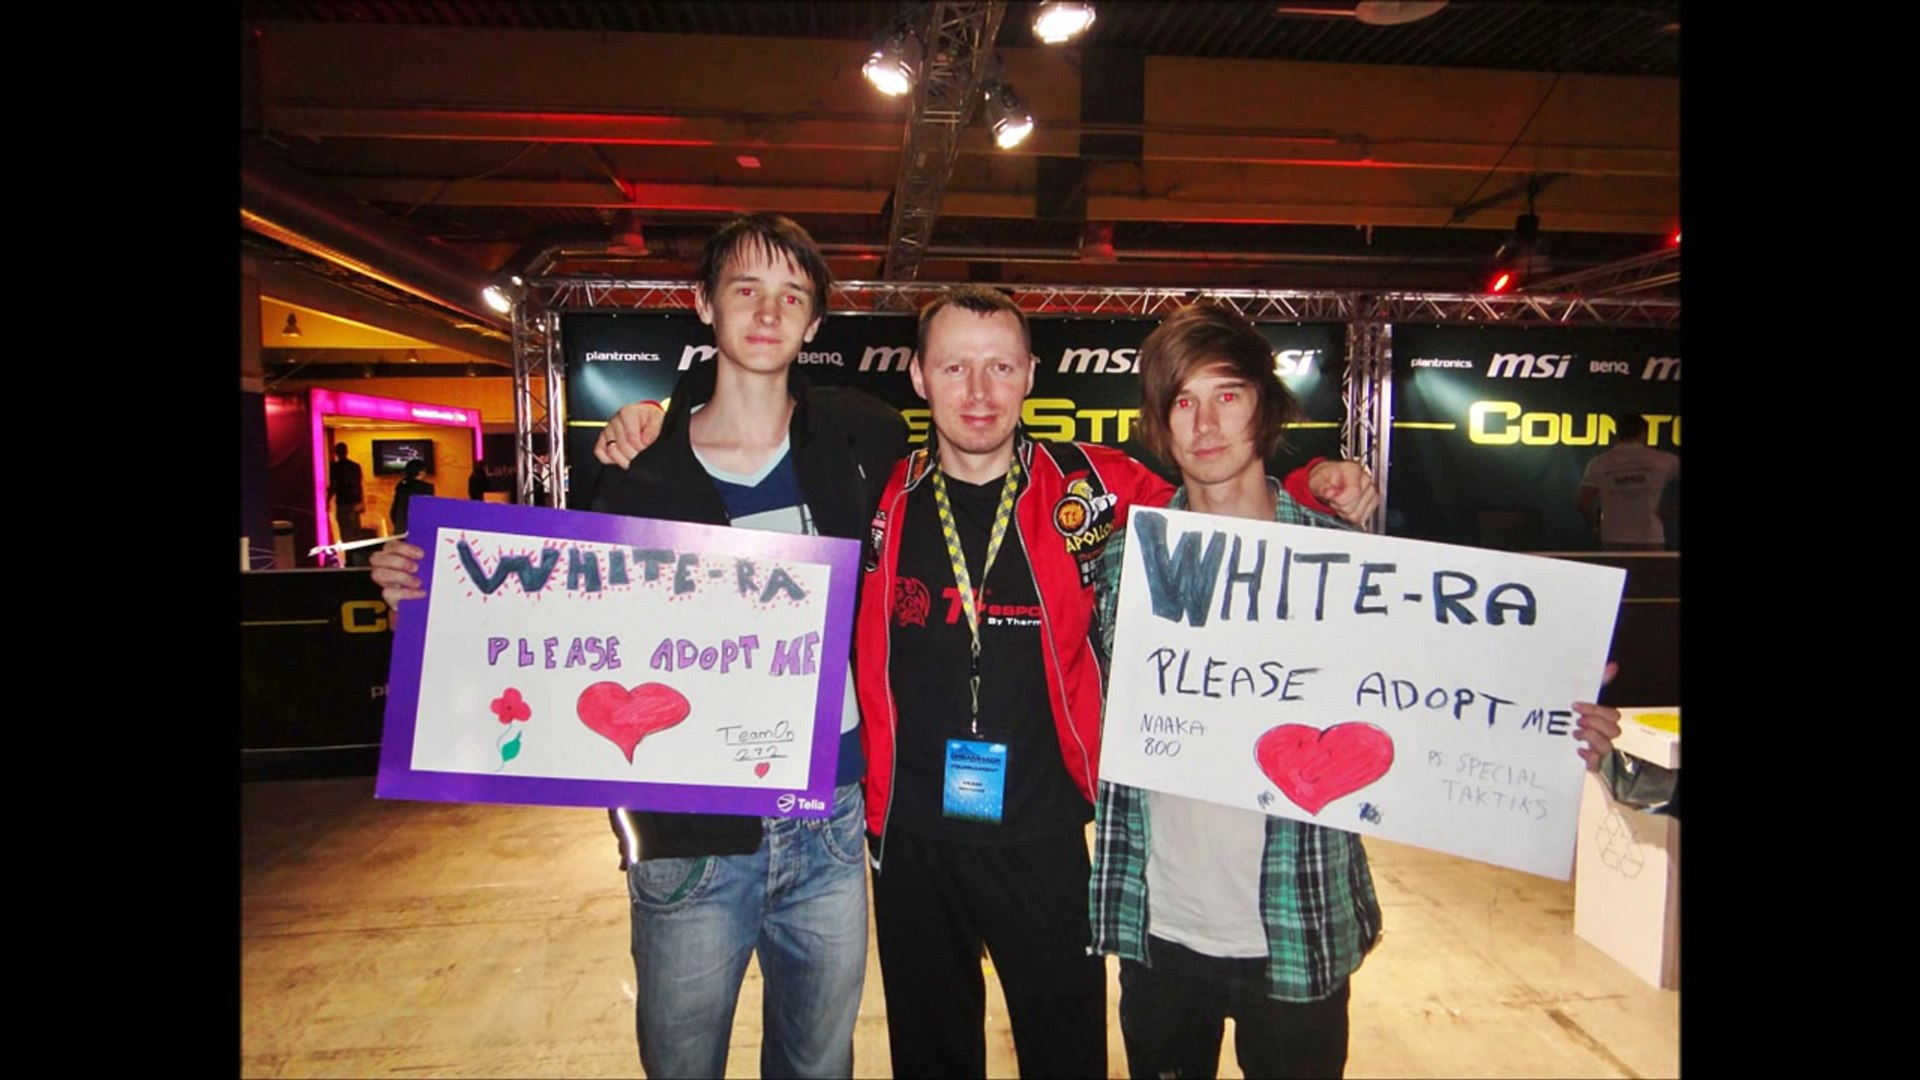 SC2News interviews WhiteRa